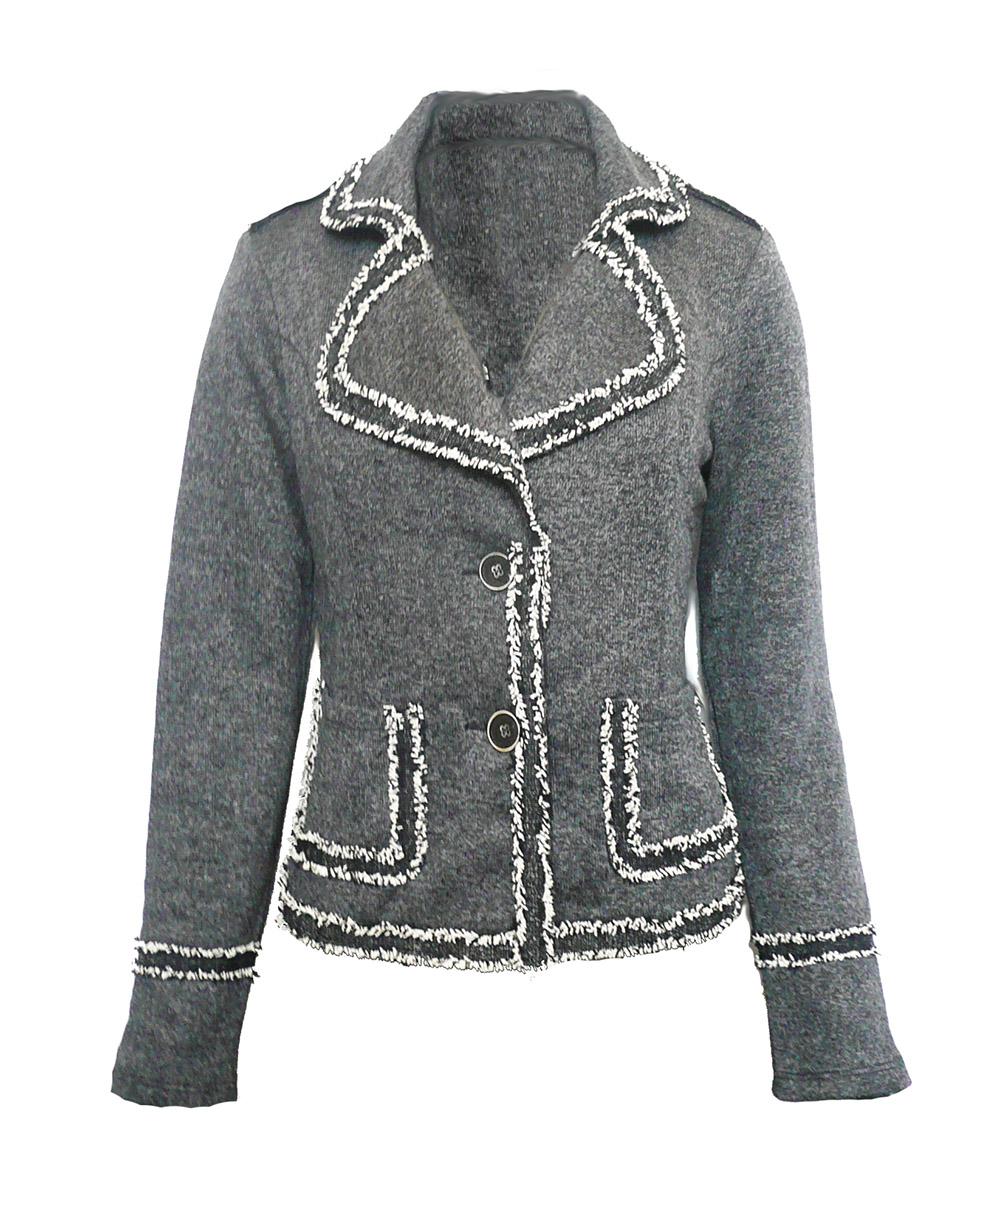 jkt grey knit chanel.jpg